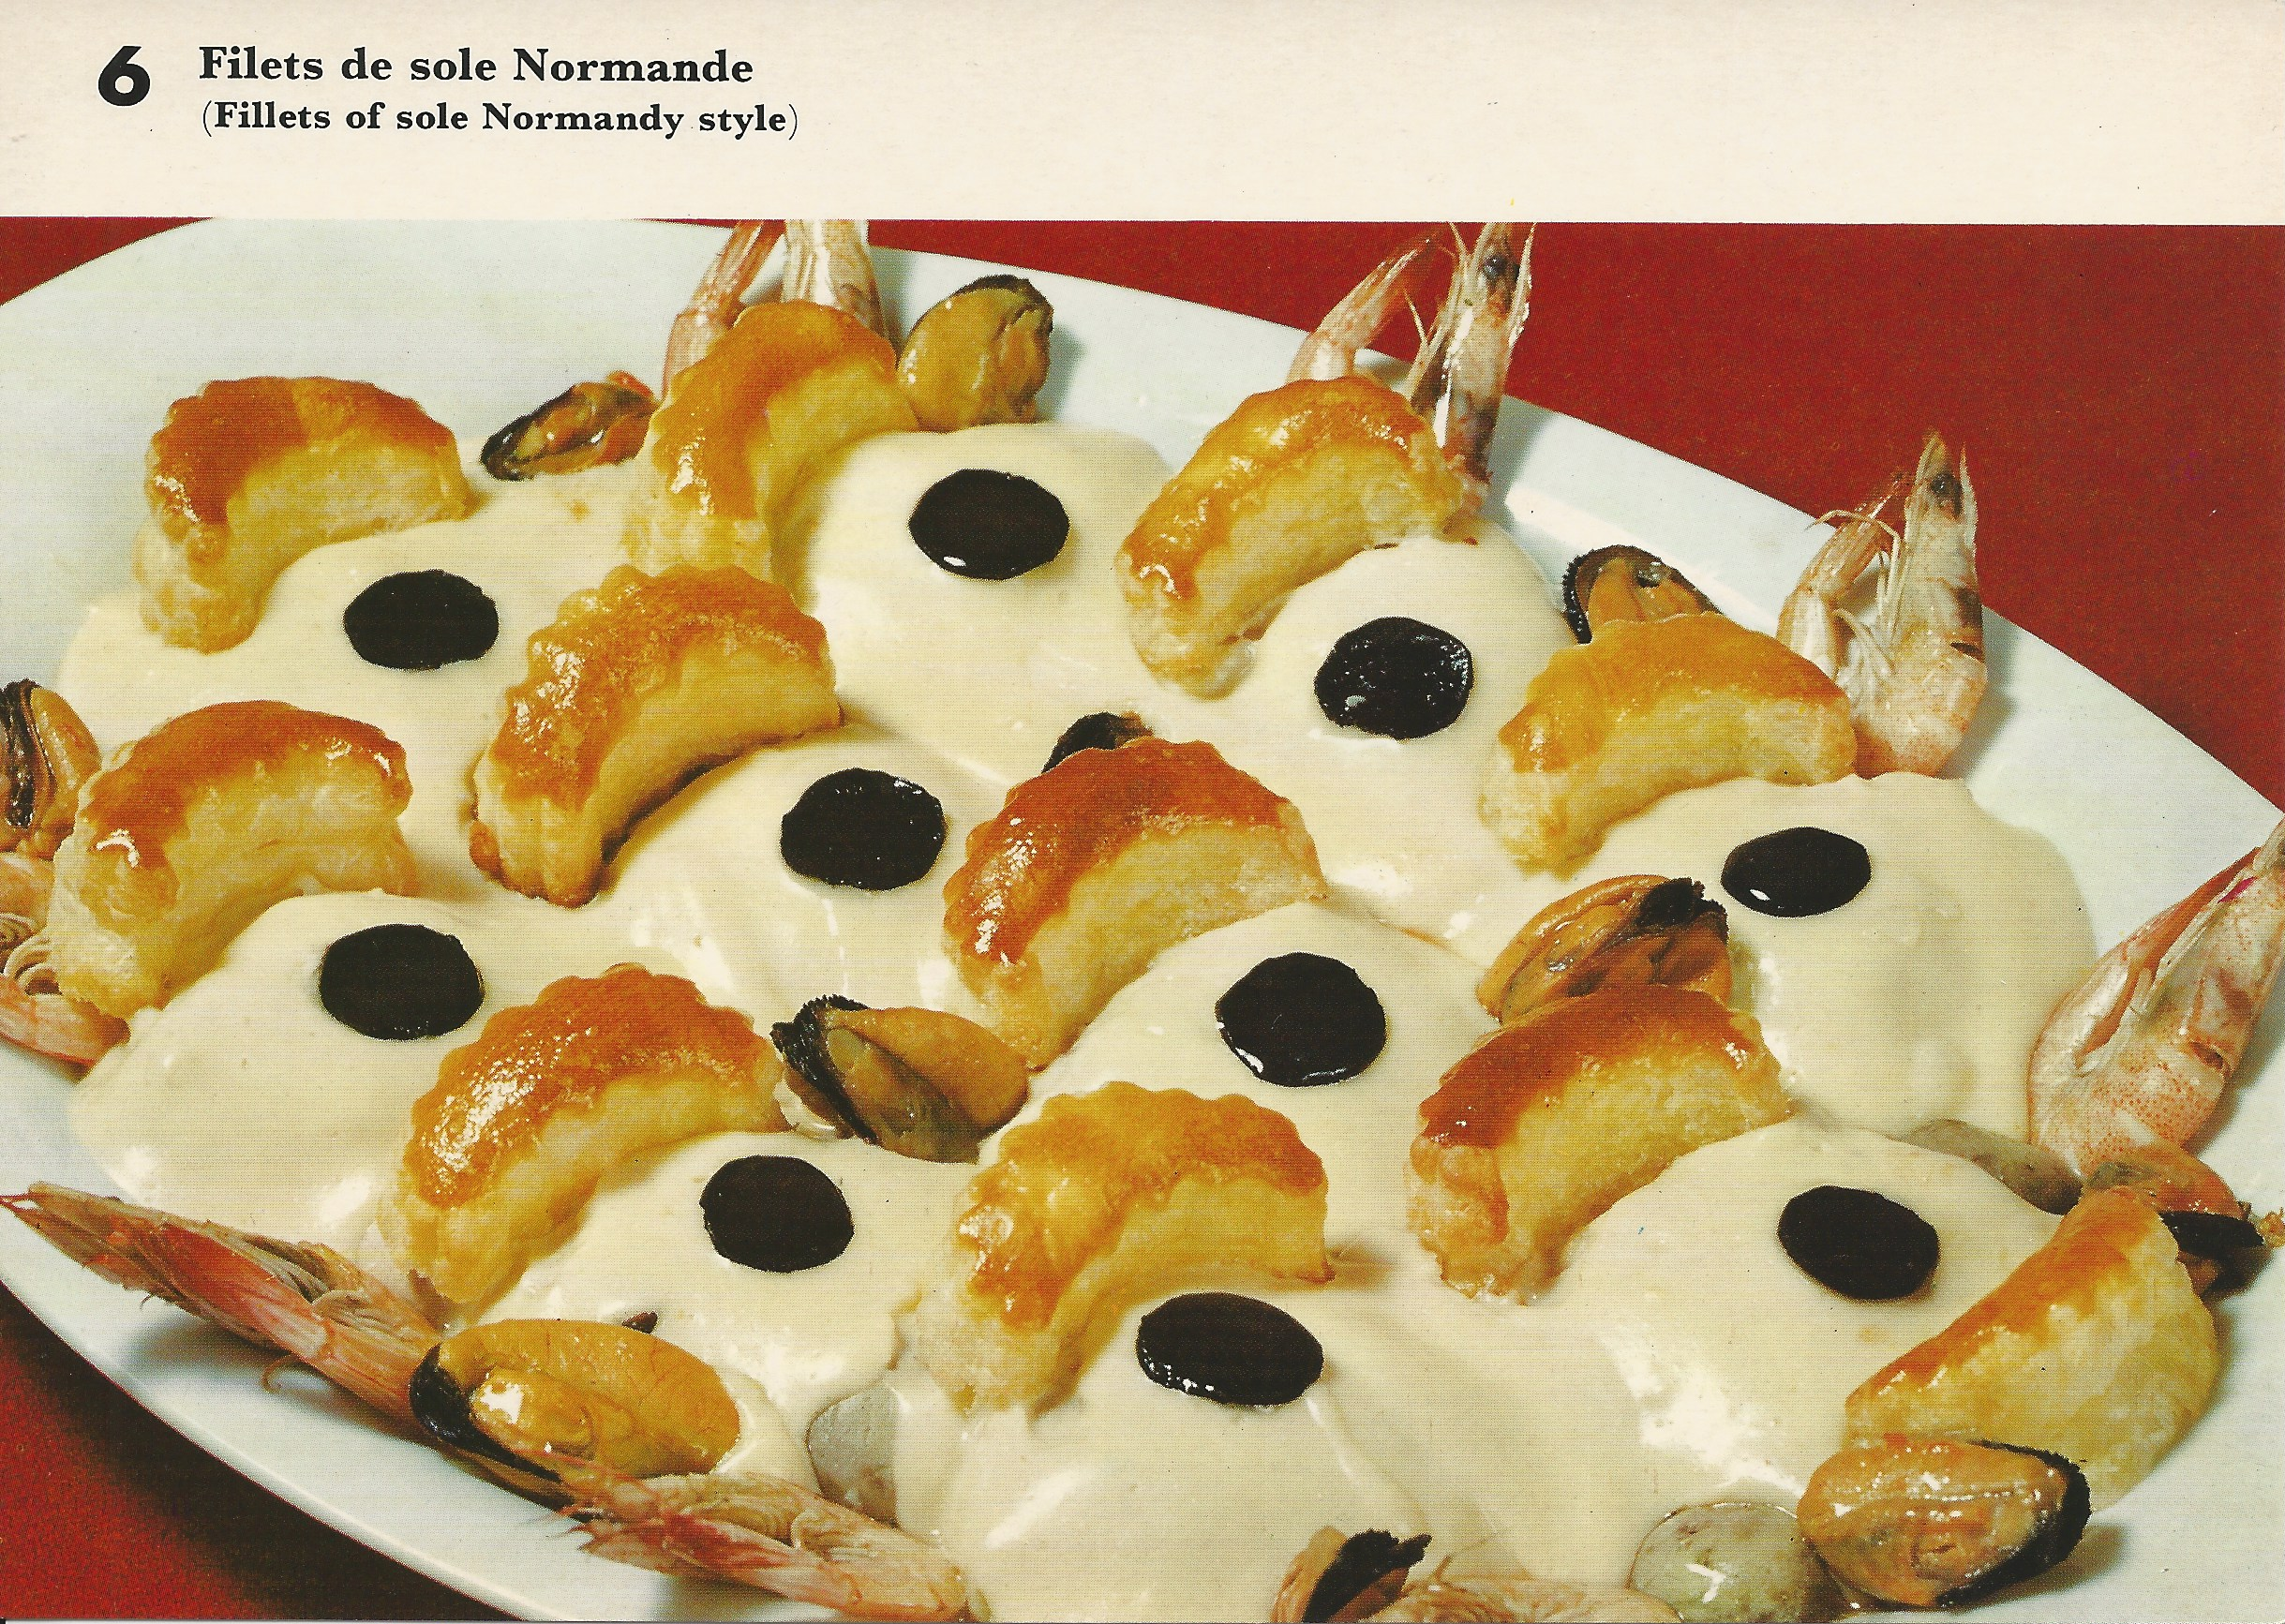 Filets de sole Normande (Fillets of sole Normandy style)  Vintage